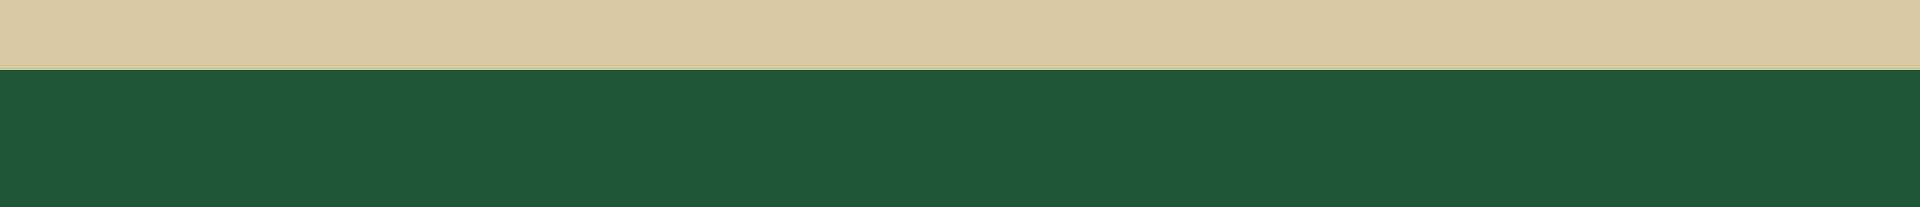 beige green